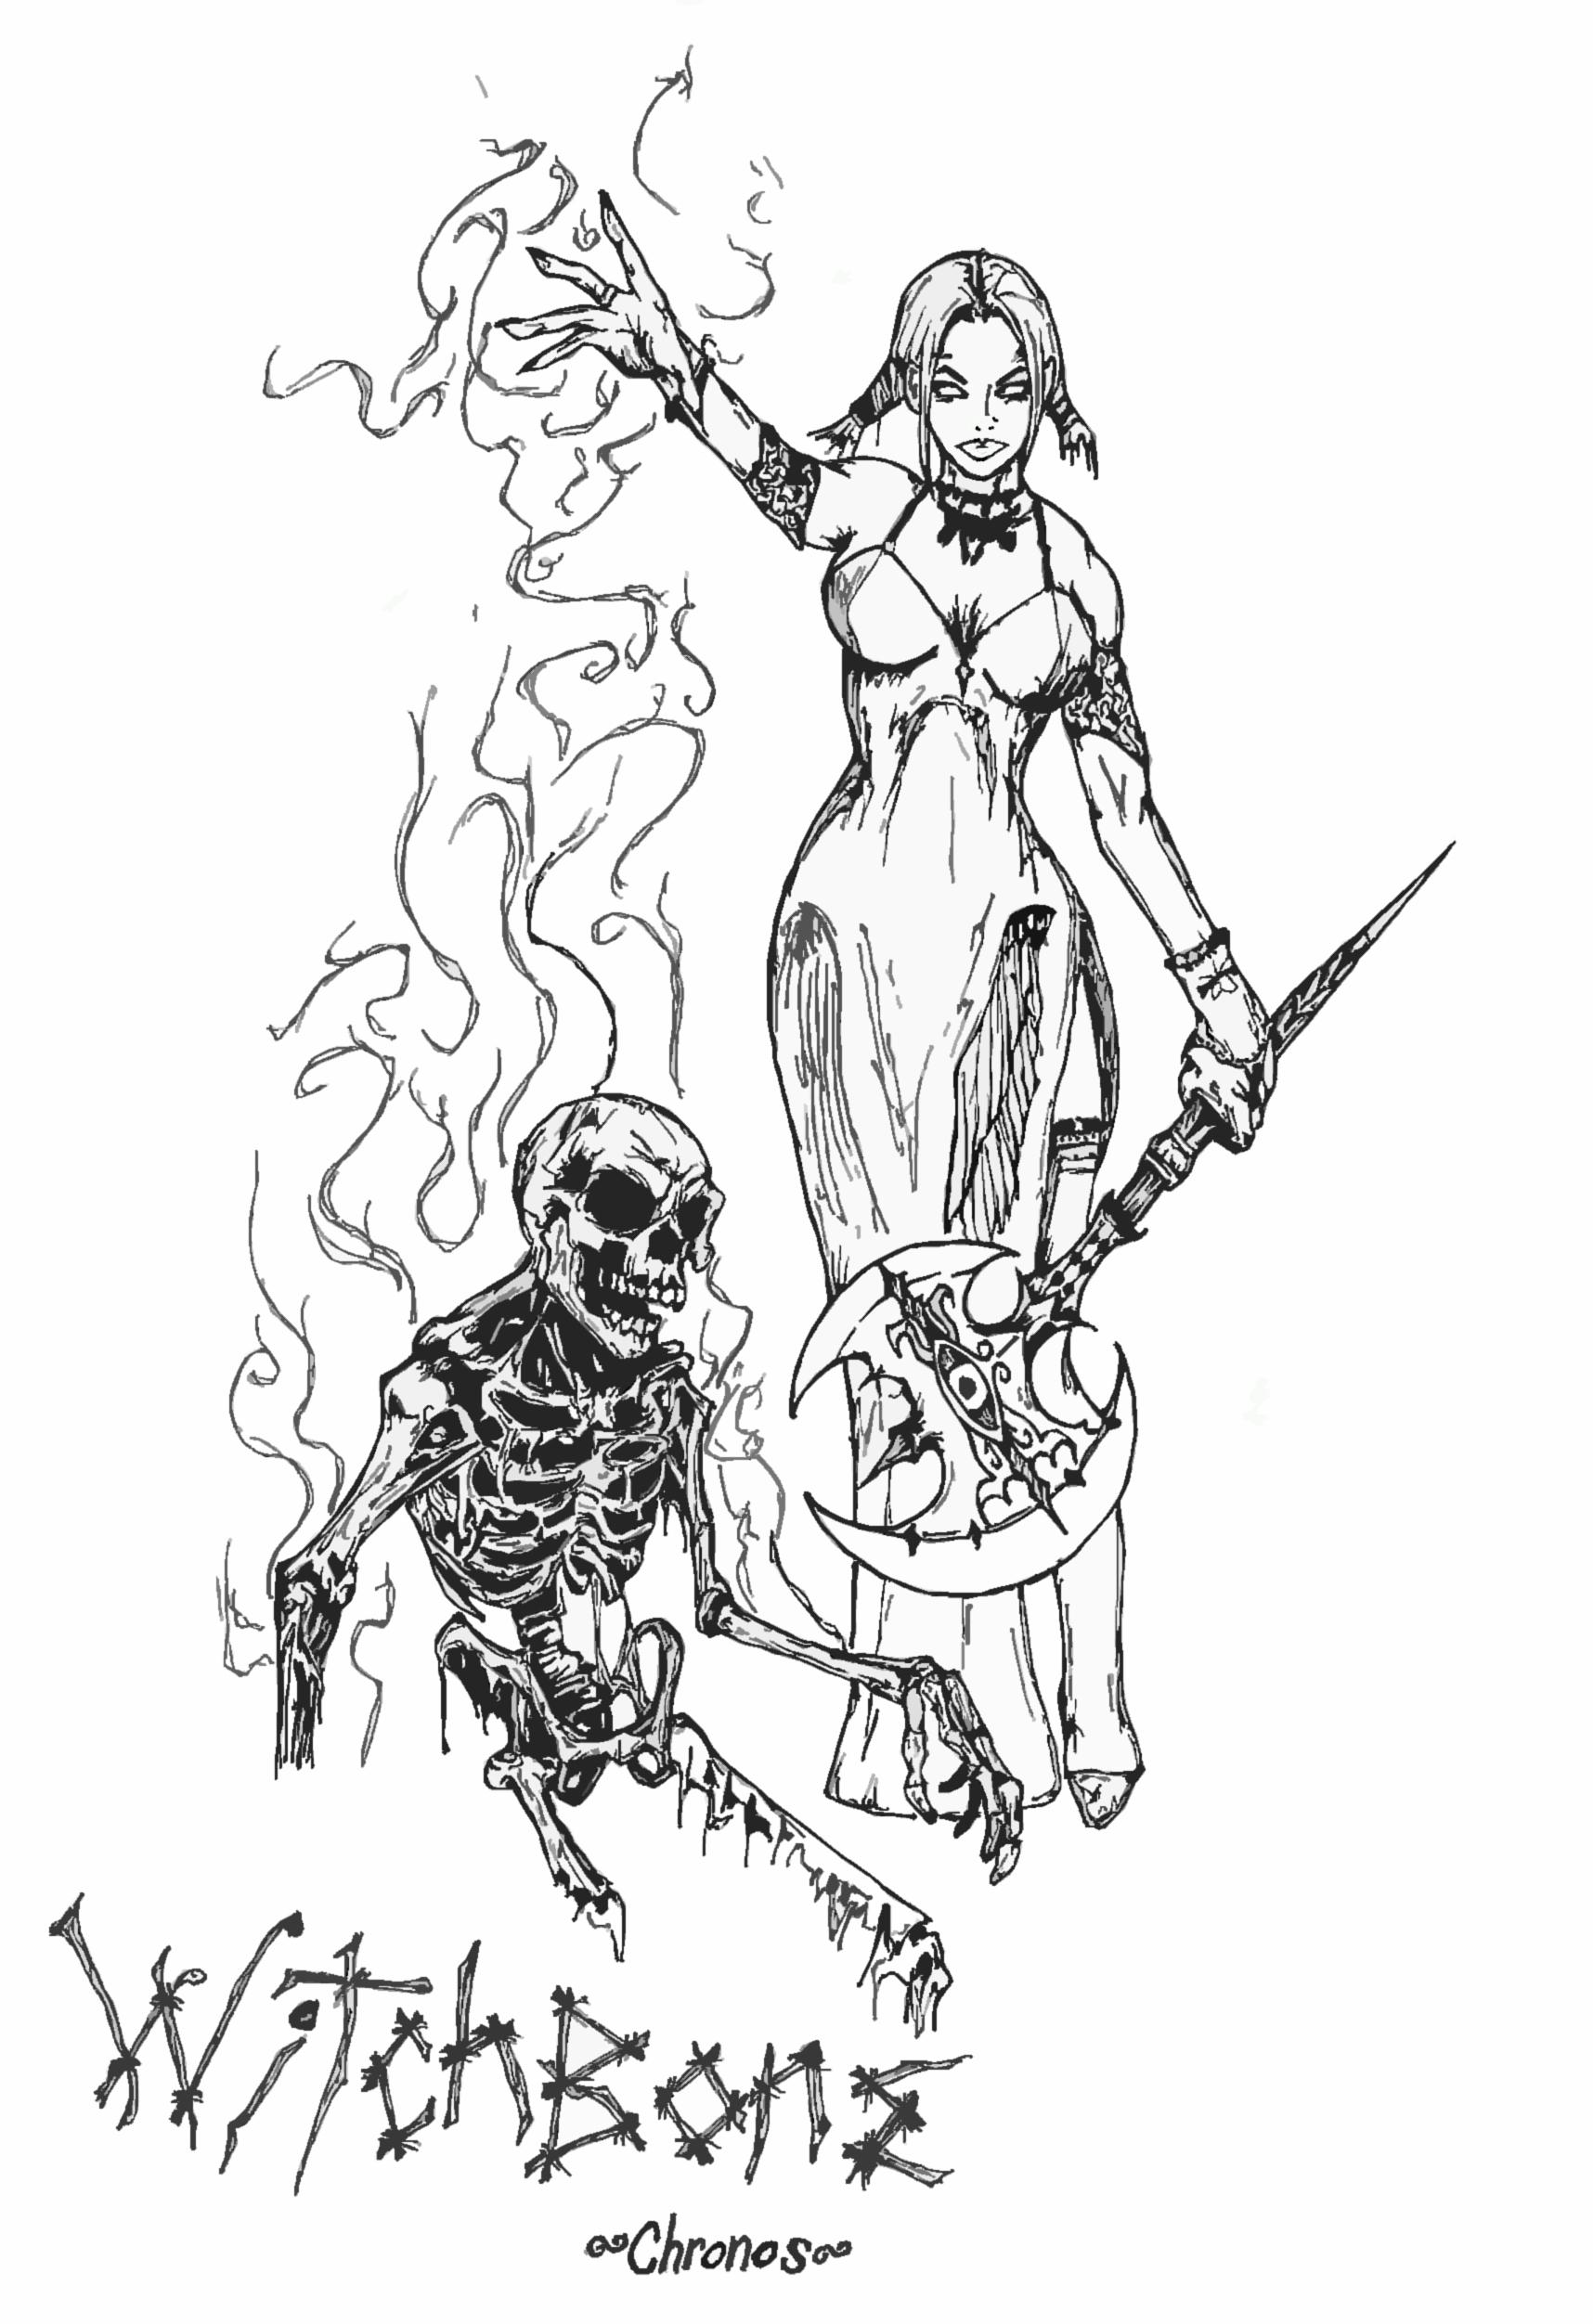 WitchBone by GrimZombie